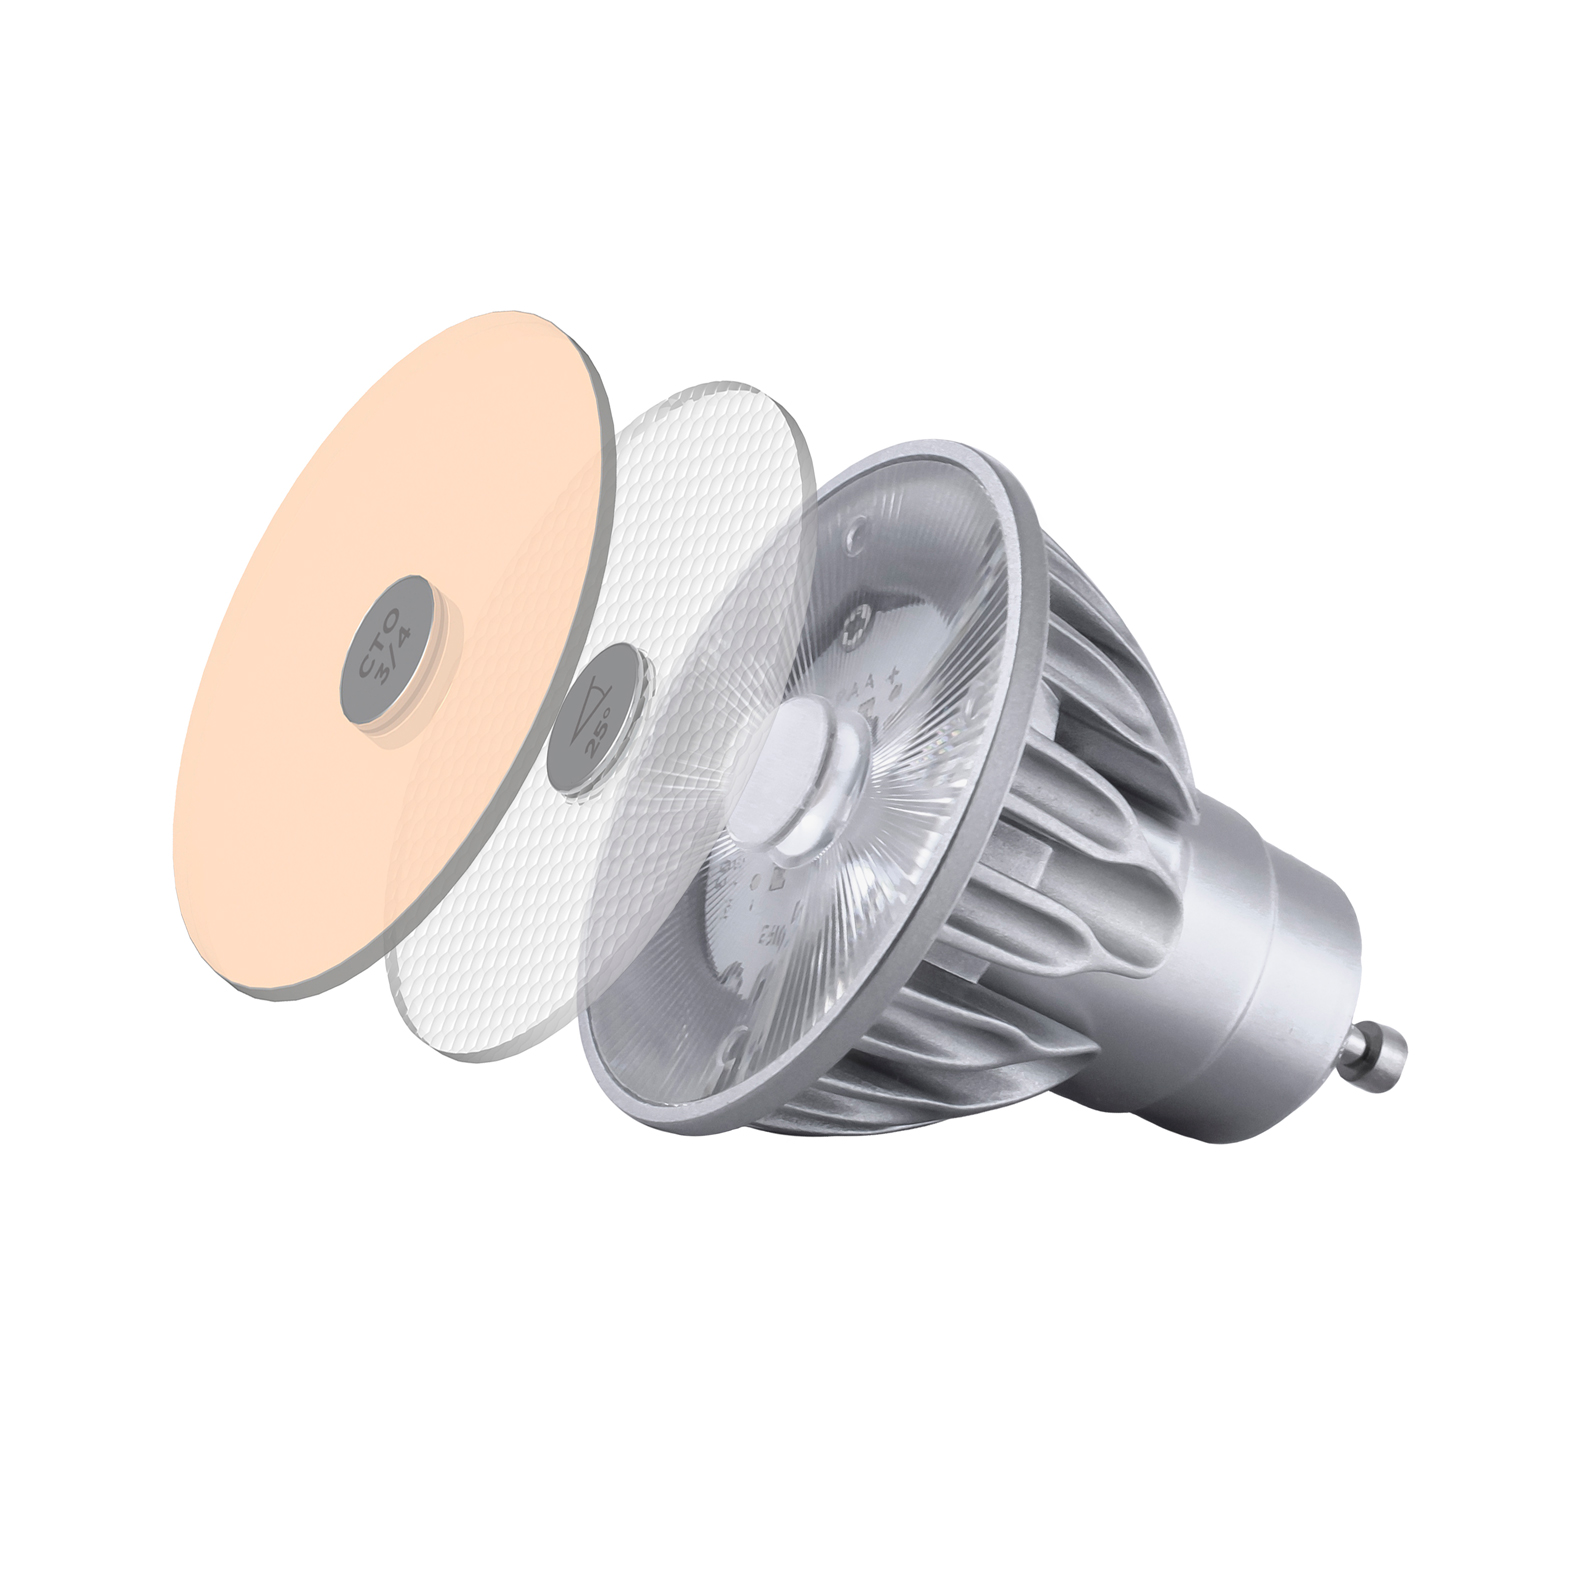 Soraa-LED-Brilliant-GU10-Snap-System-Snaps Wunderbar Led Gu 10 Dekorationen